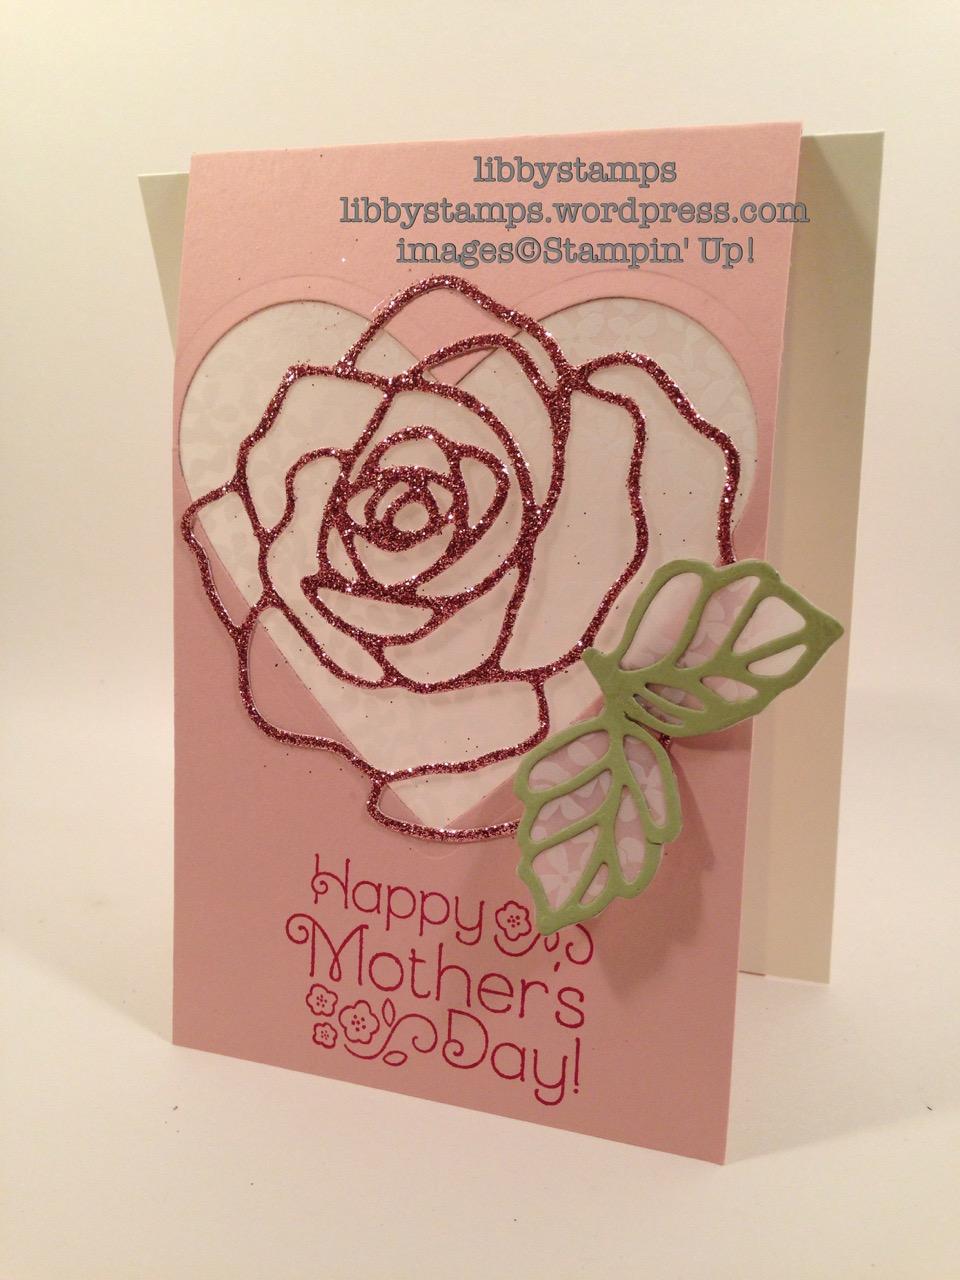 libbystamps, Stampin' Up, Lovely Little Wreath, Rose Garden Thinlits, Blushing Bride Glimmer Paper, Botanical Gardens Vellum, Mother's Day, TSOT269